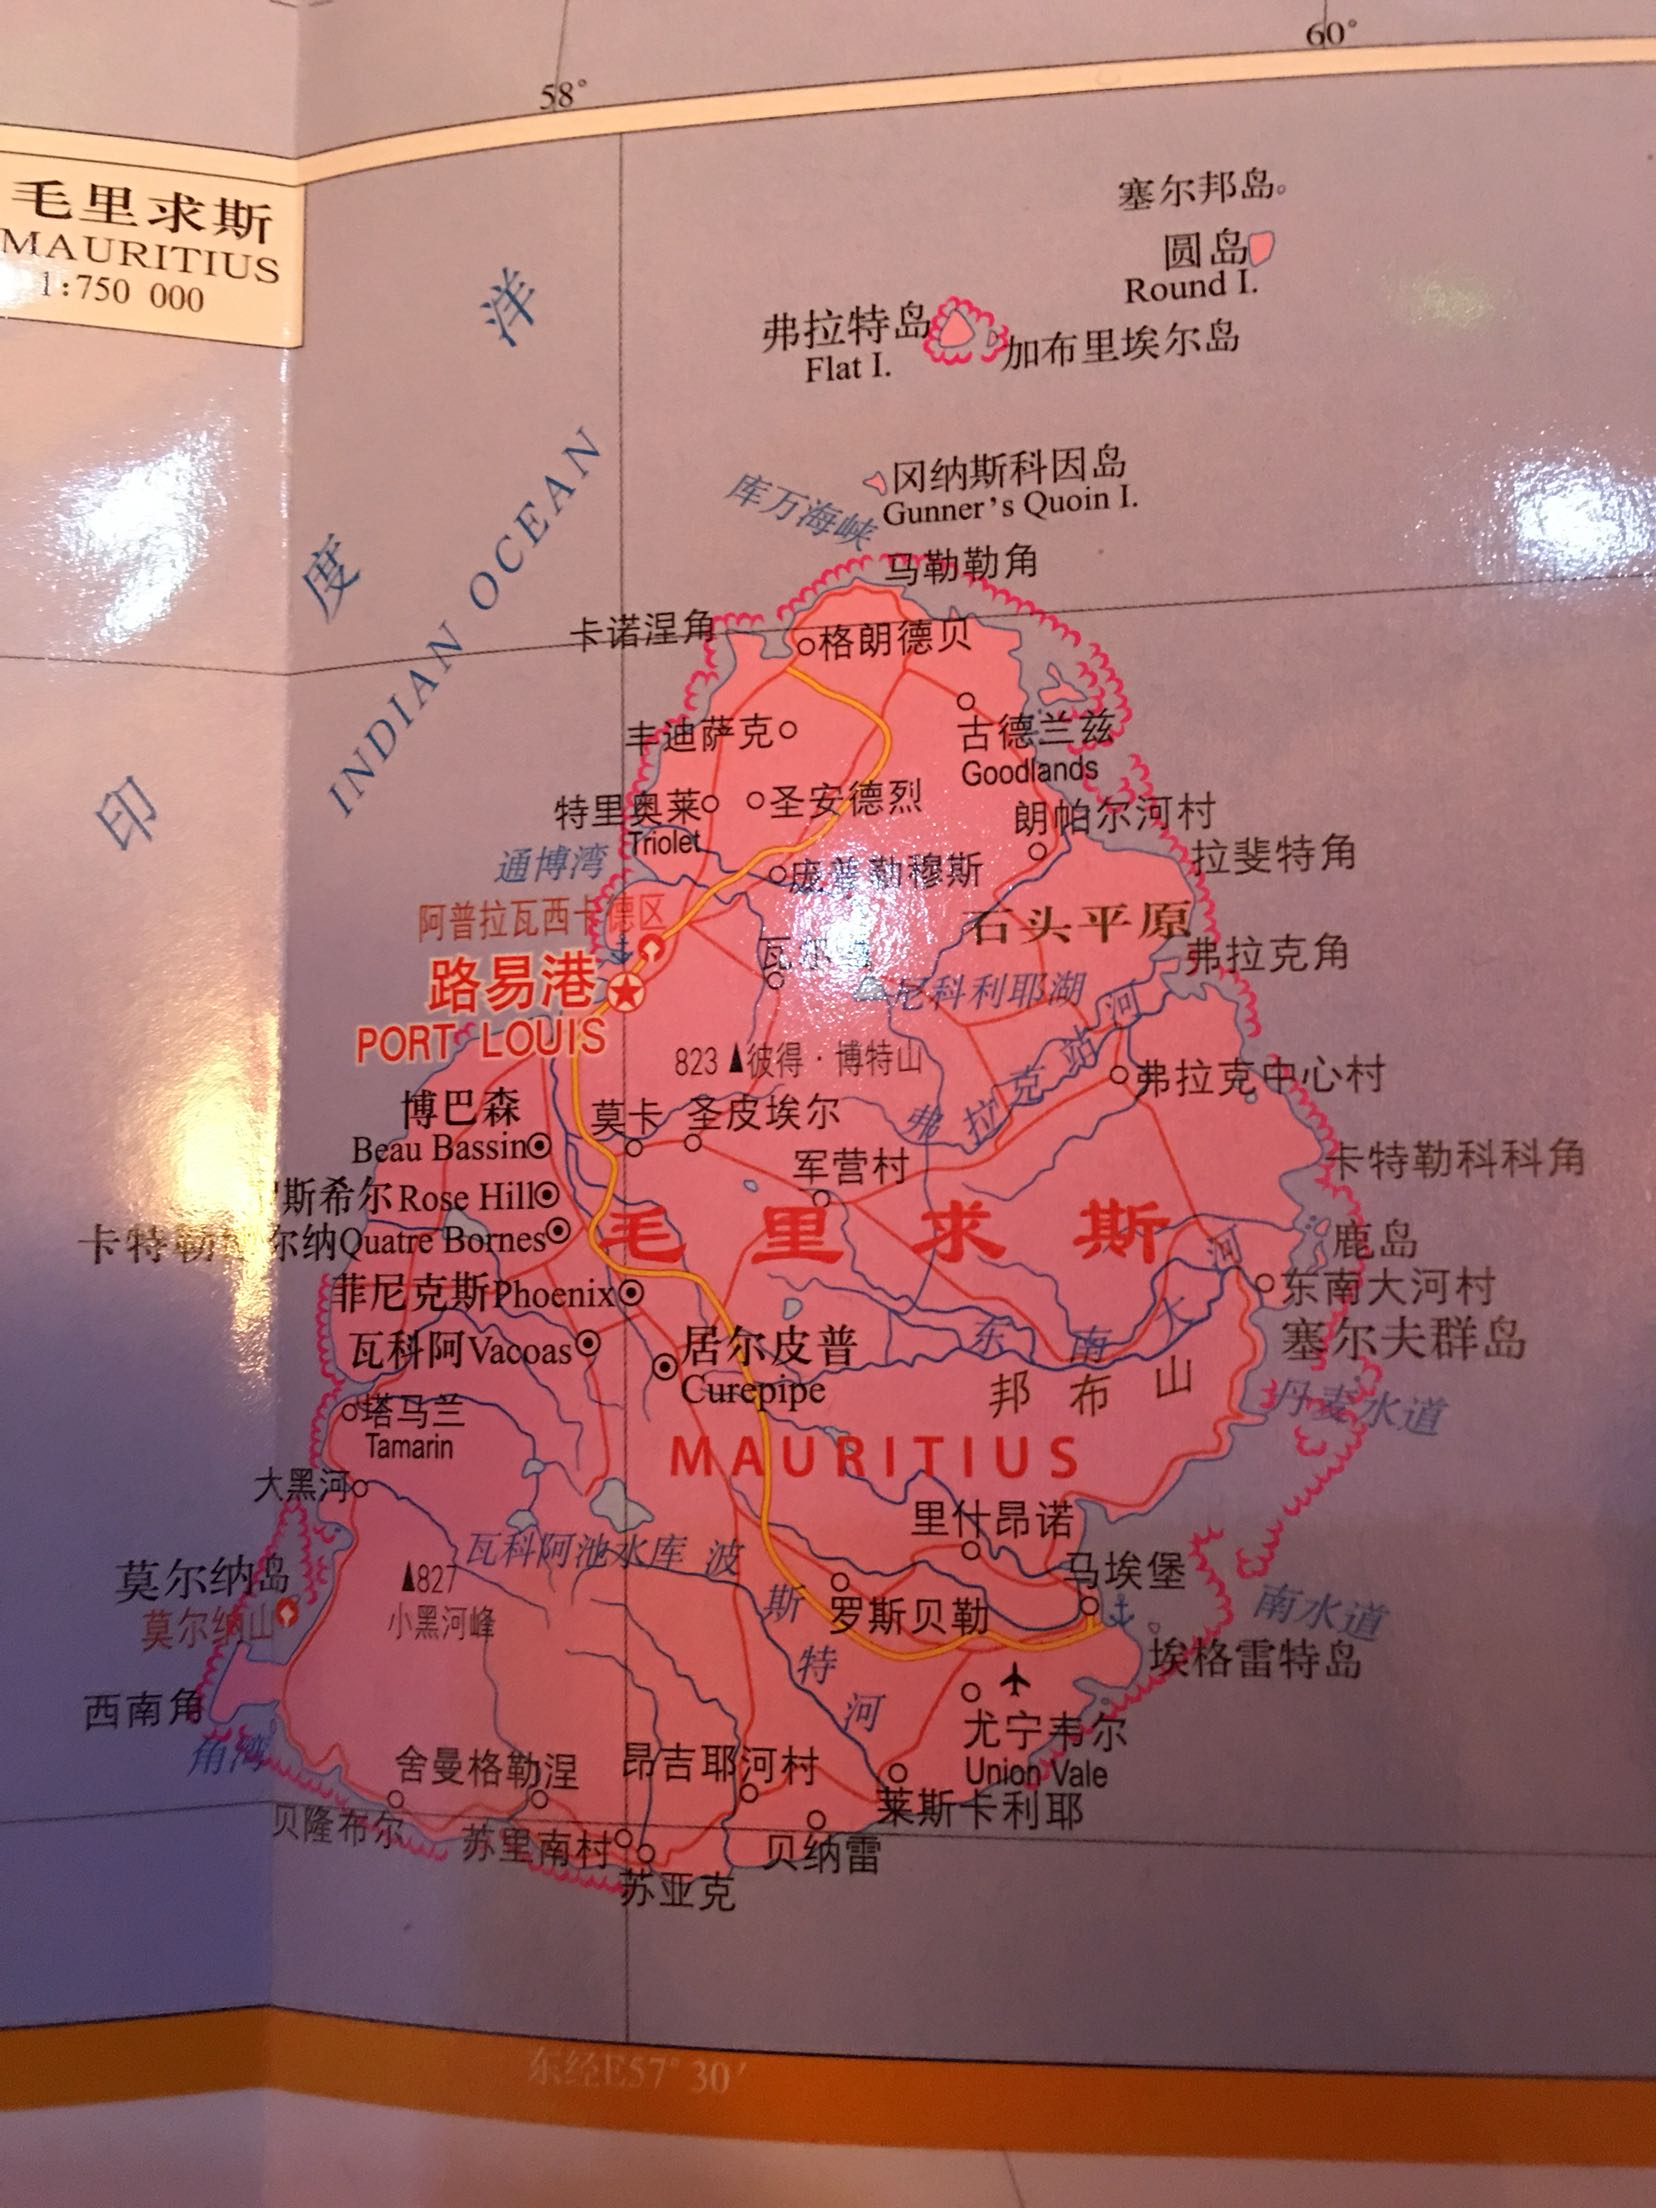 Translating World Map of the World